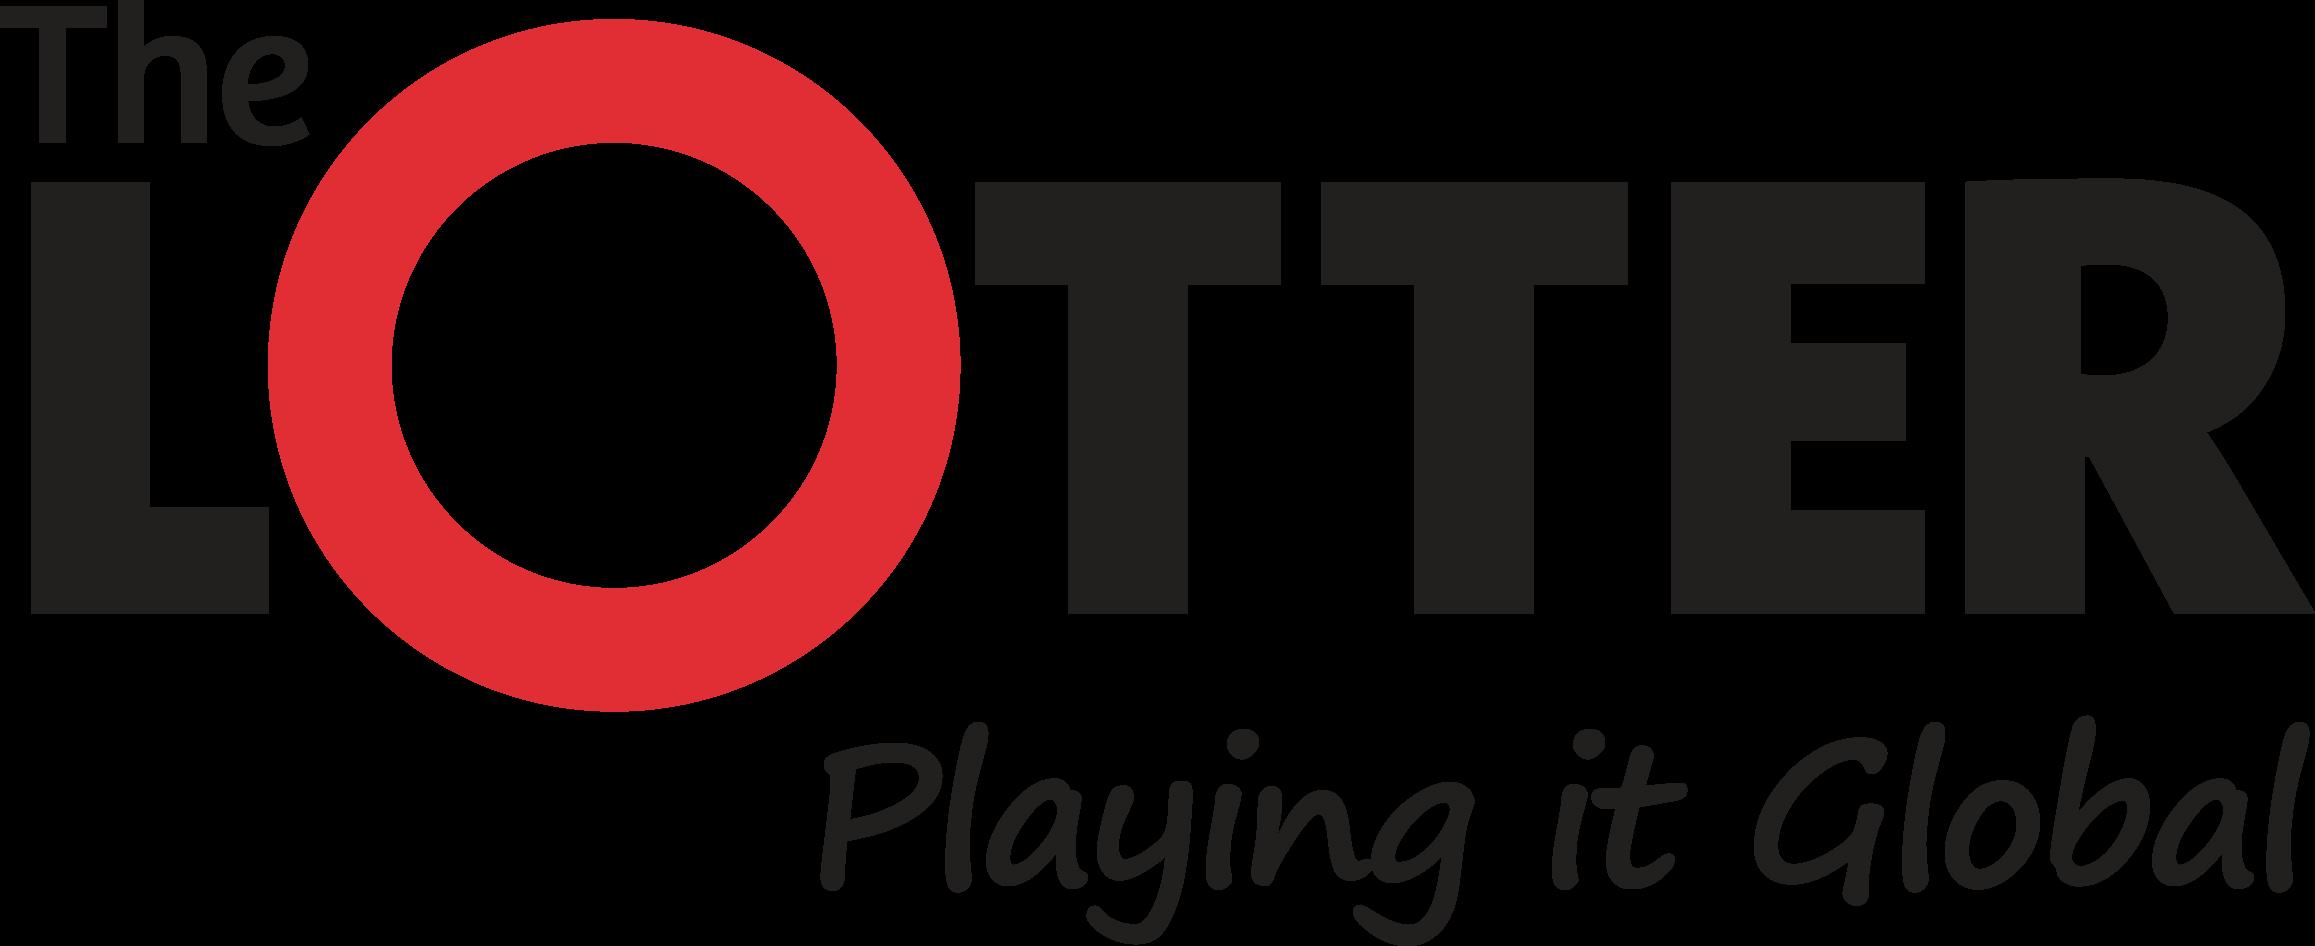 theLotter logo